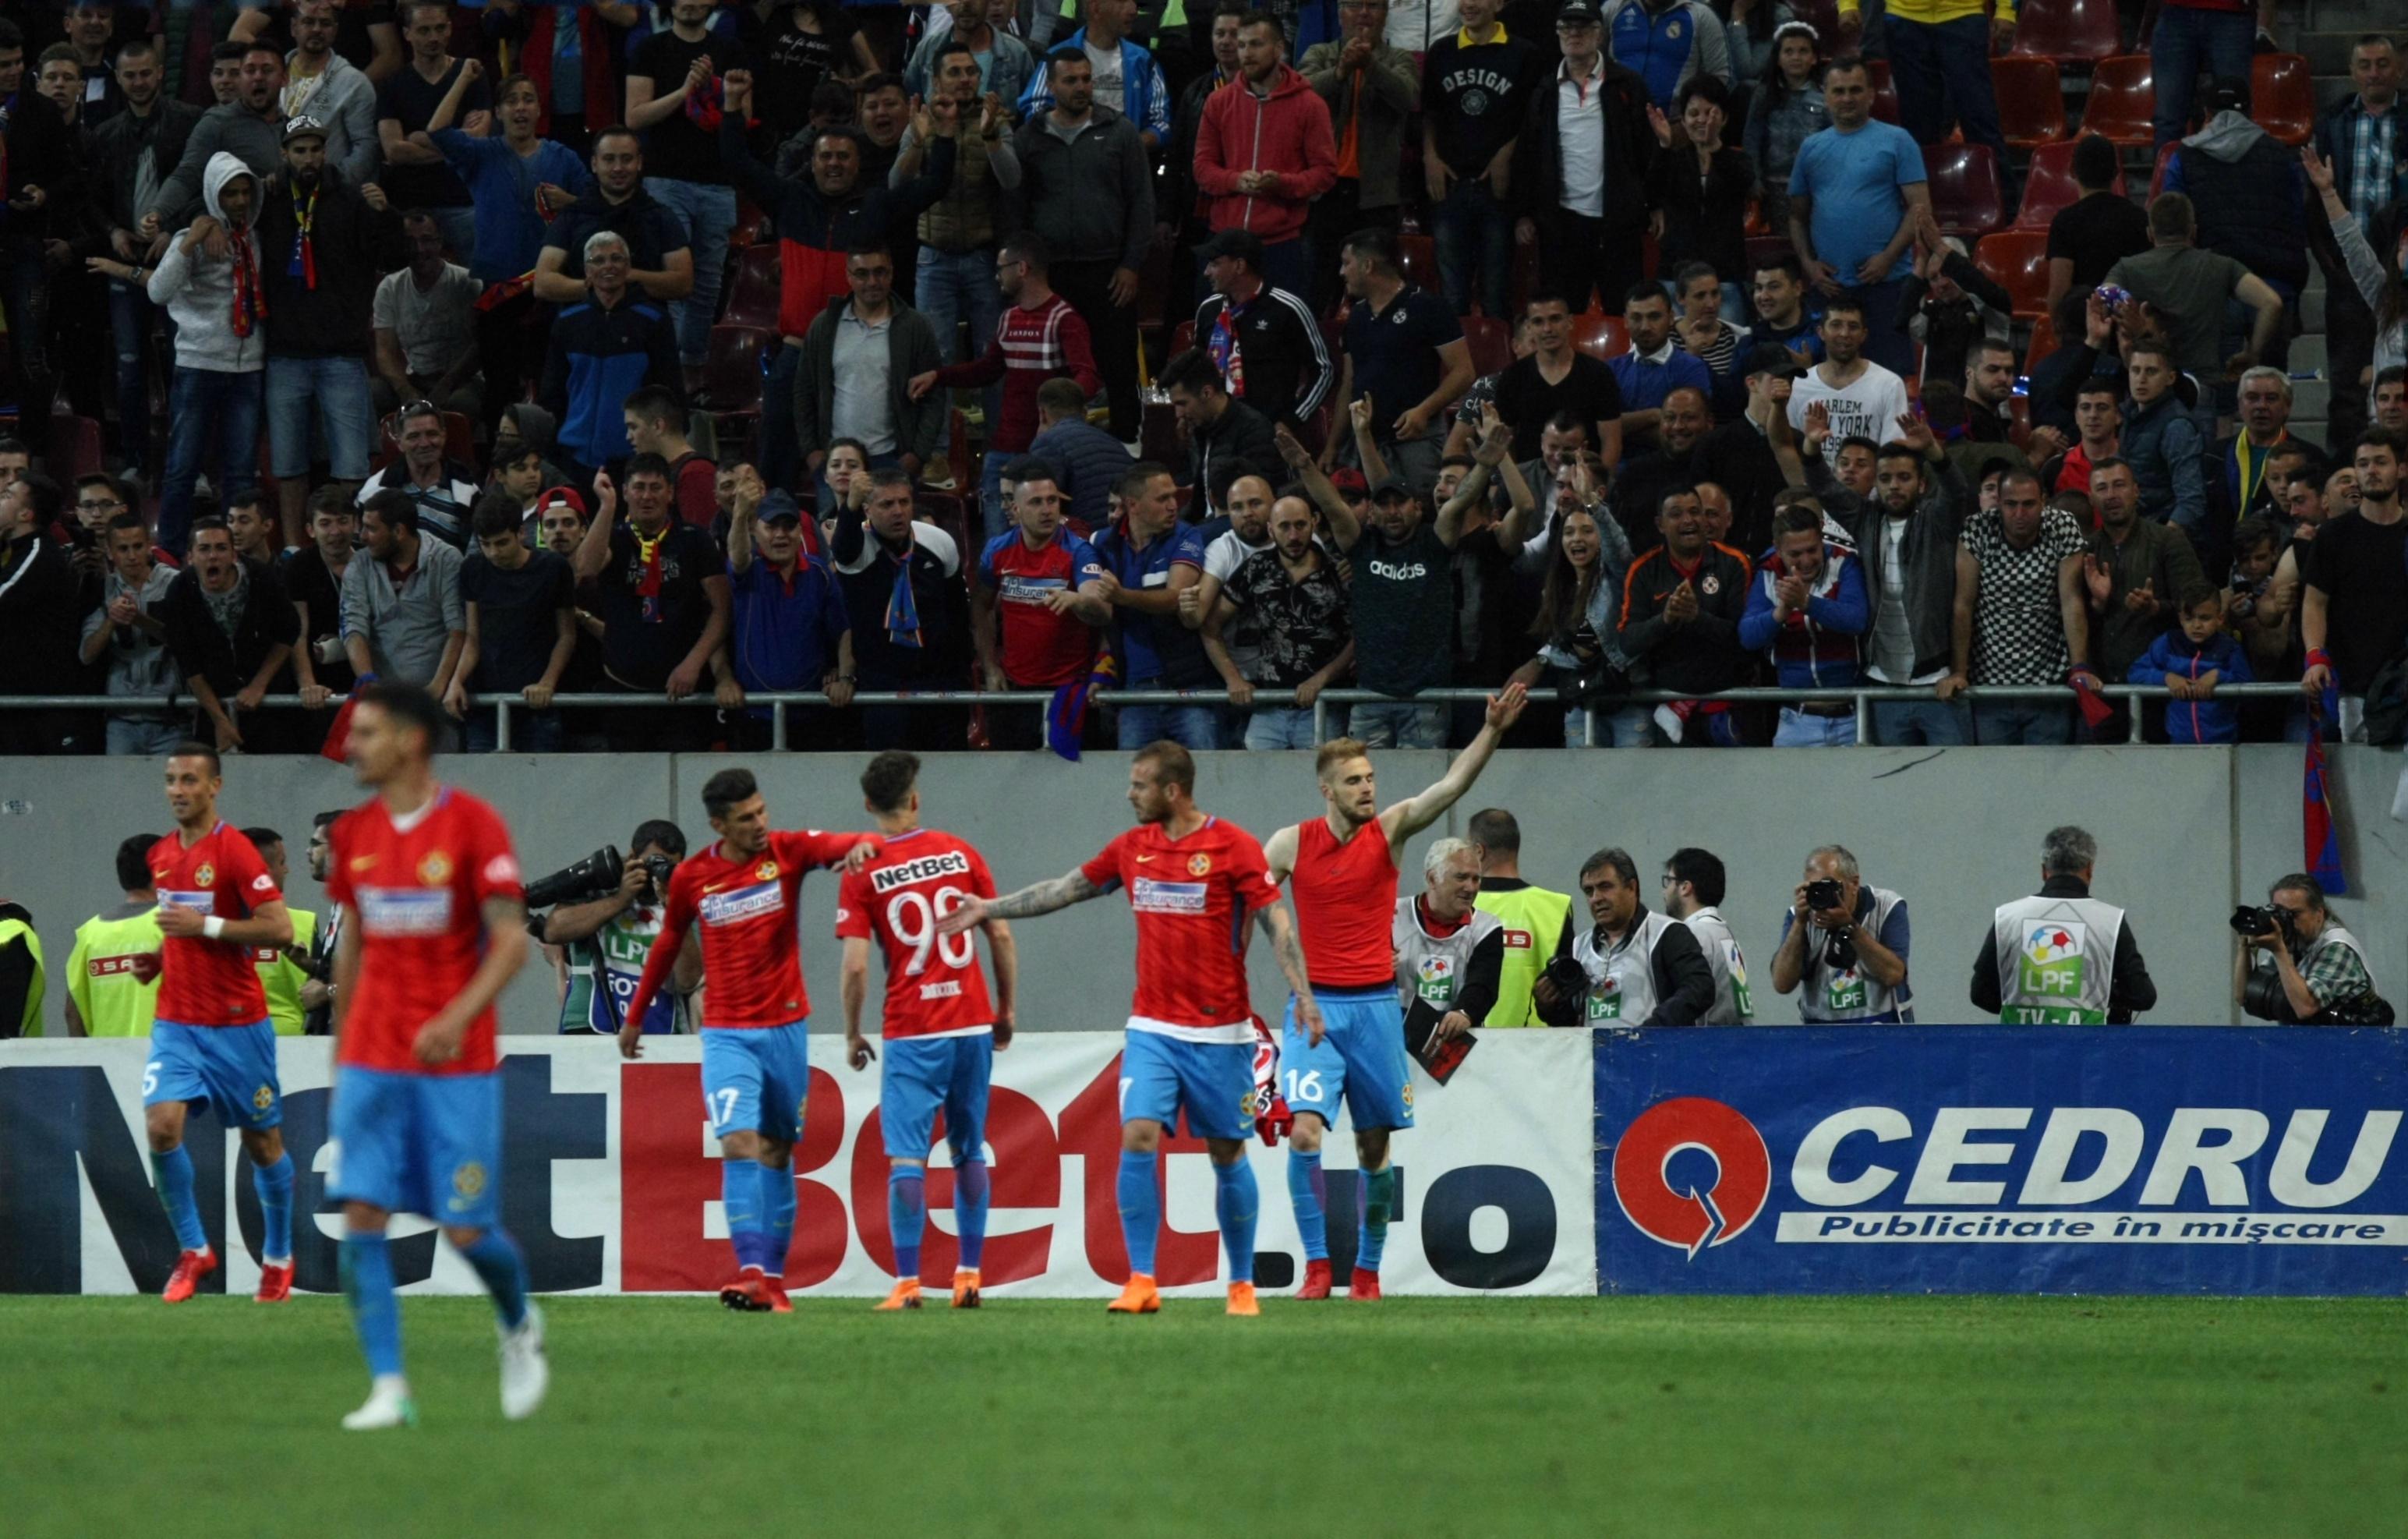 LIVE BLOG FCSB - CFR Cluj, Liga 1 la fotbal, play-off, etapa 7. Gazdele au egalat în prelungiri. Titlul se joacă